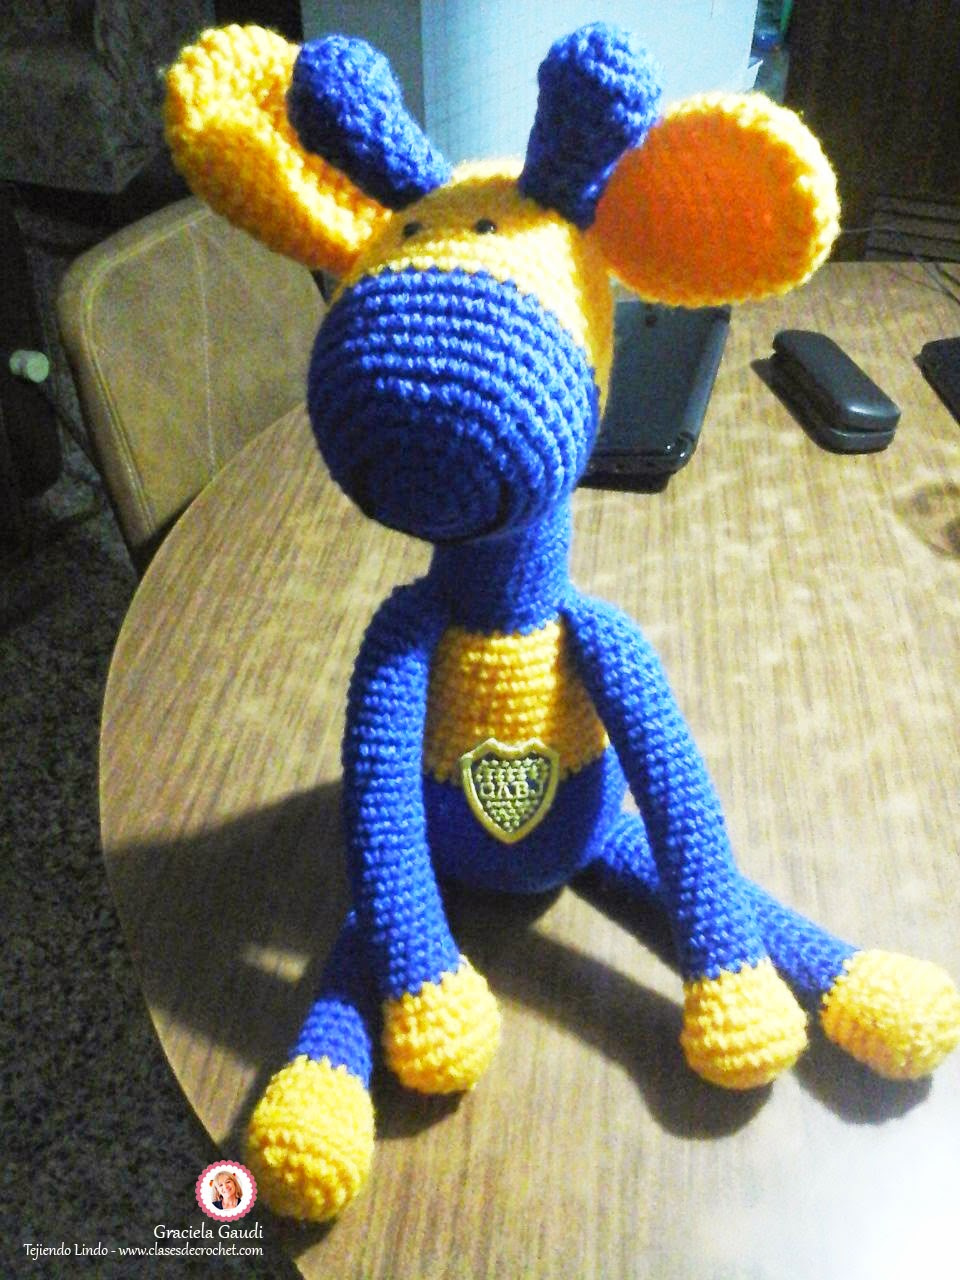 Crochet Giraffe PATTERN Amigurumi giraffe pattern pdf tutorial ... | 1280x960